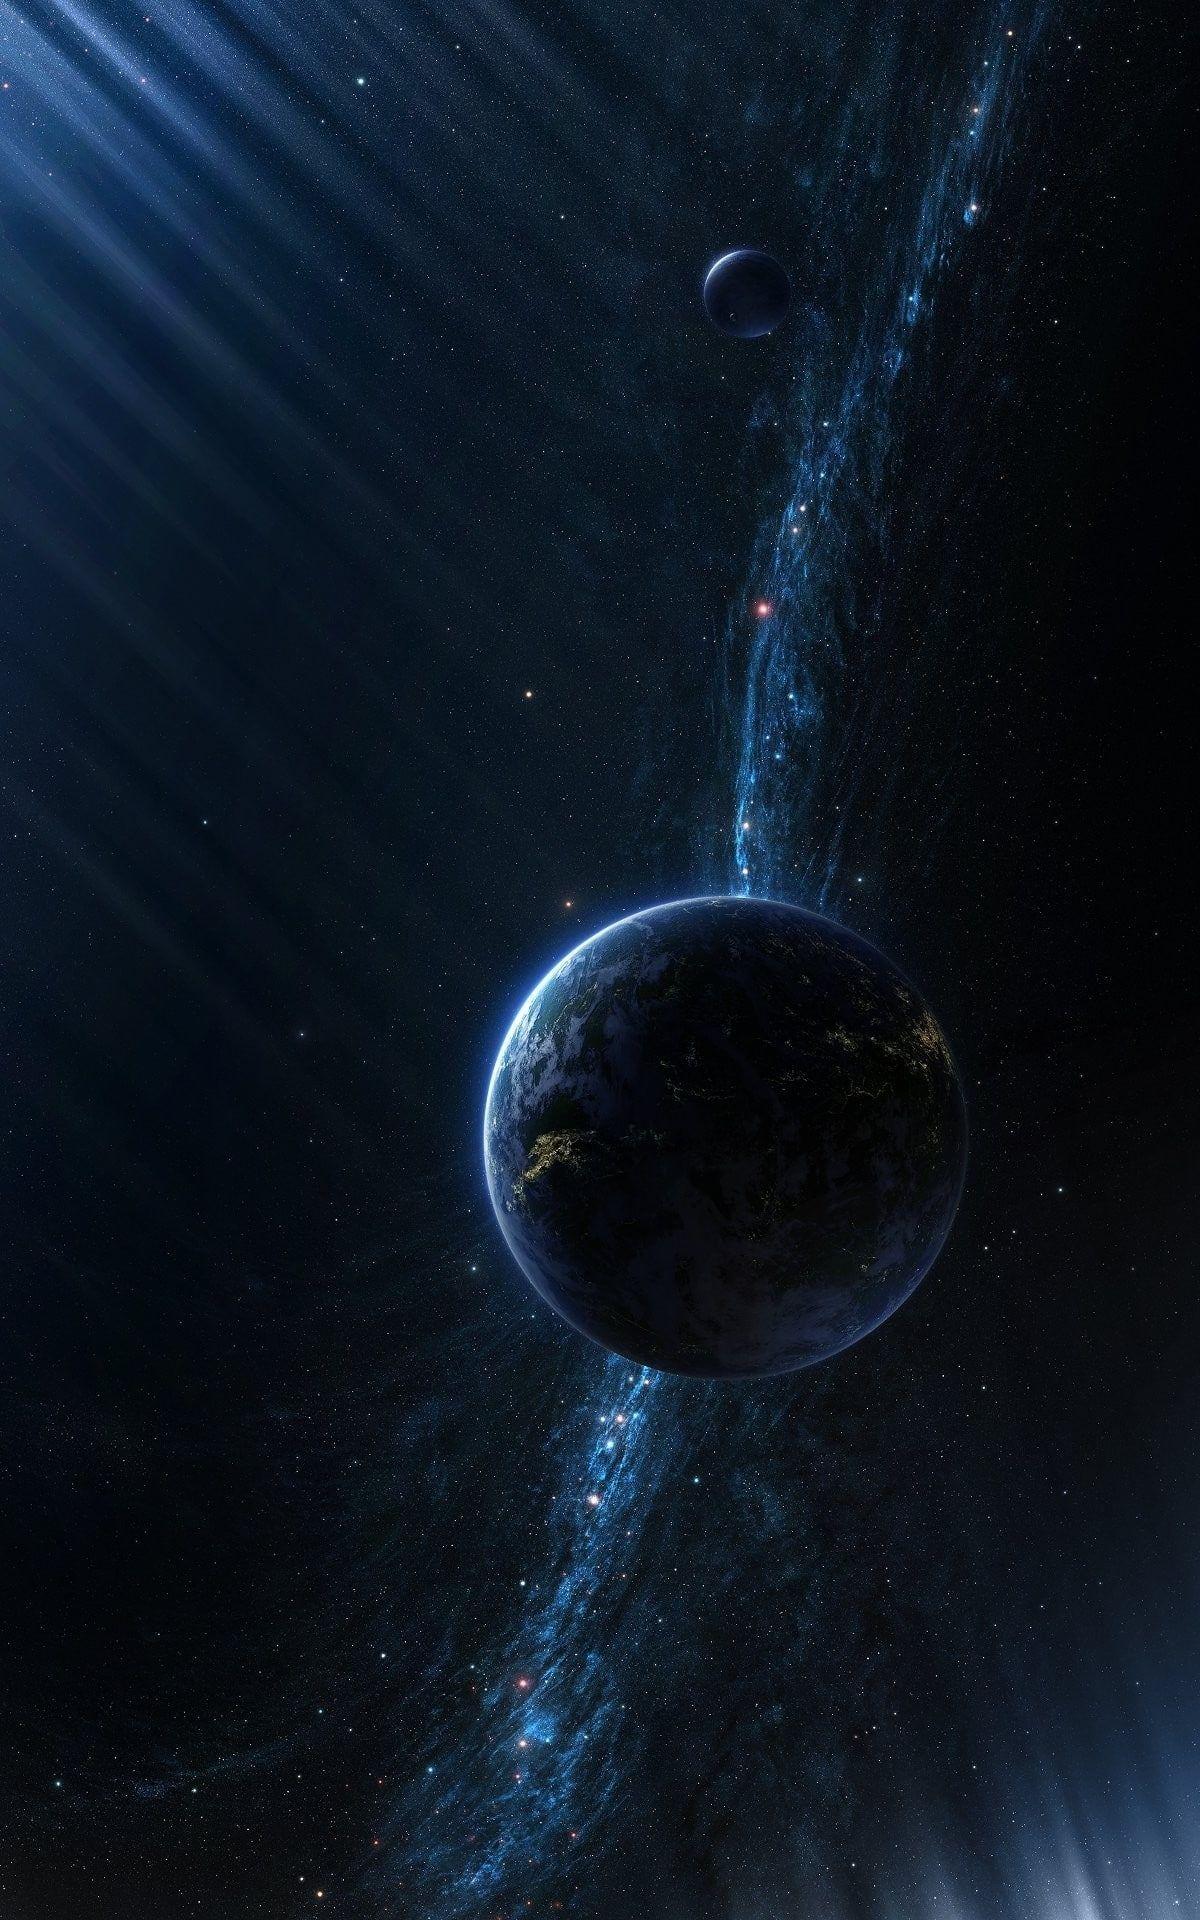 Digital Art Portrait Display Cgi Space Universe Planet Stars Sun Rays Galaxy Milky Way 1080p Wallpaper Hdwallpa Planets Wallpaper Nebula Wallpaper Galaxy Hd